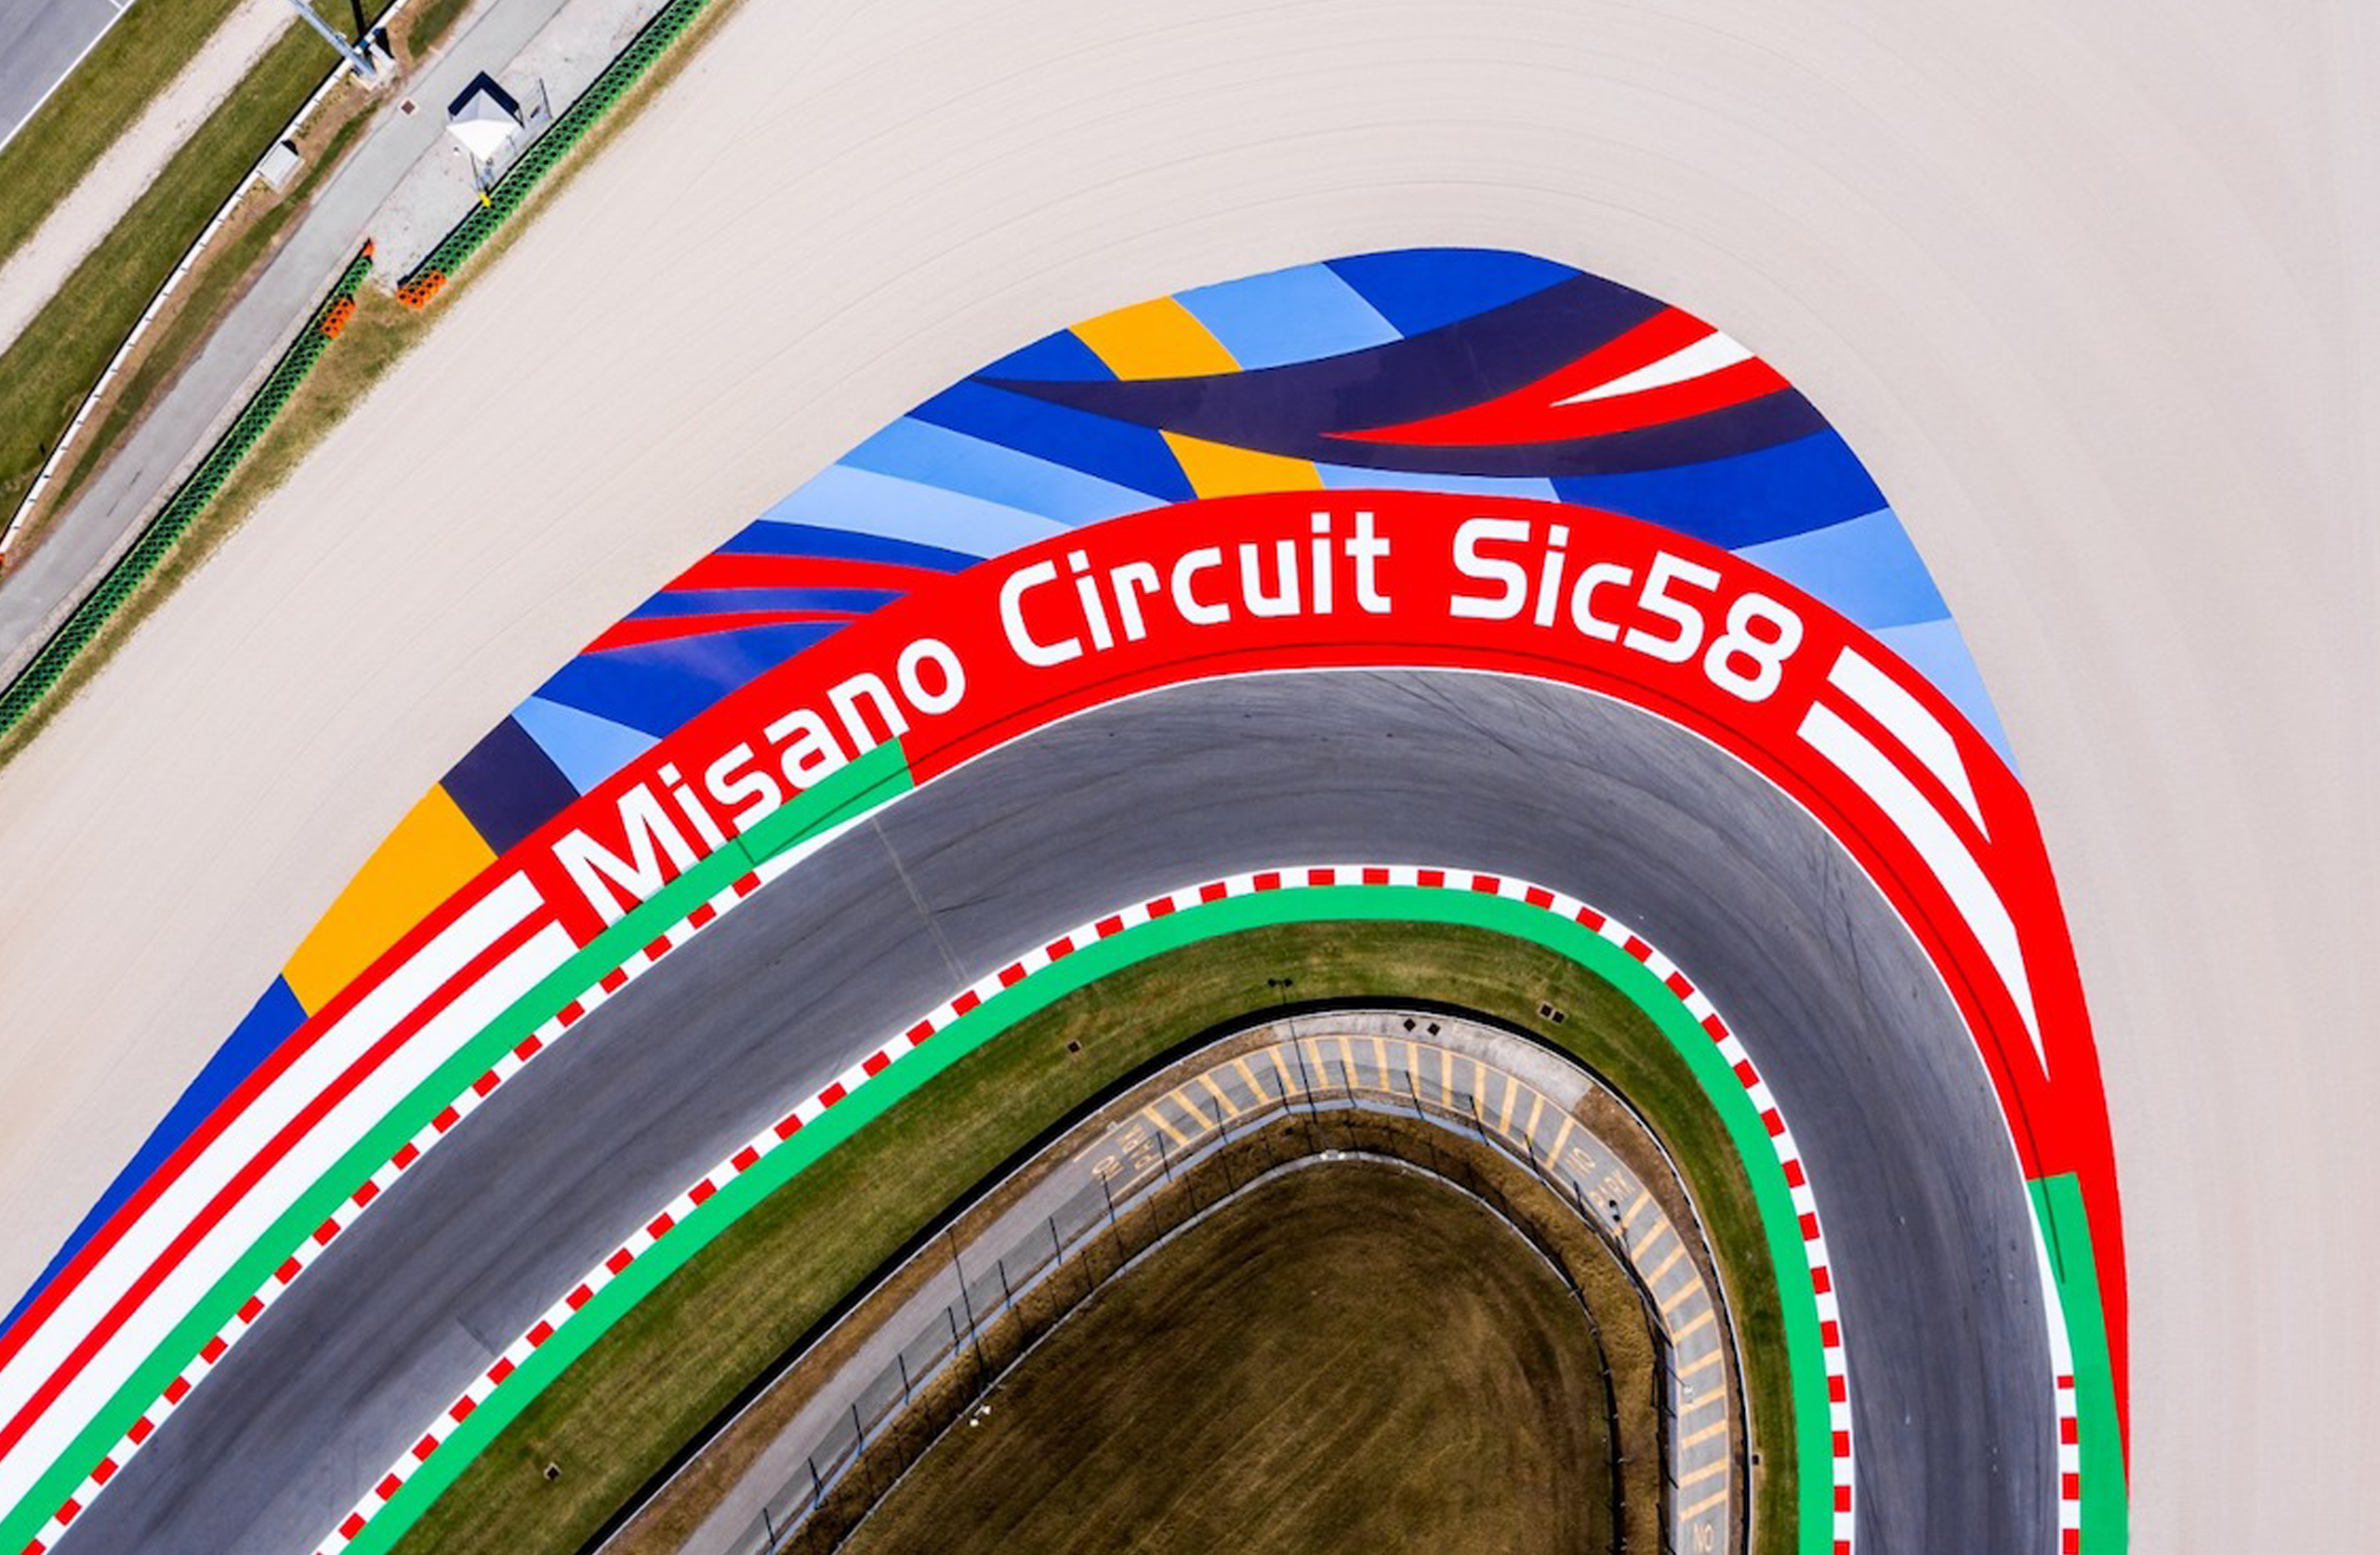 samoline_pittura colsam per circuiti sportivi